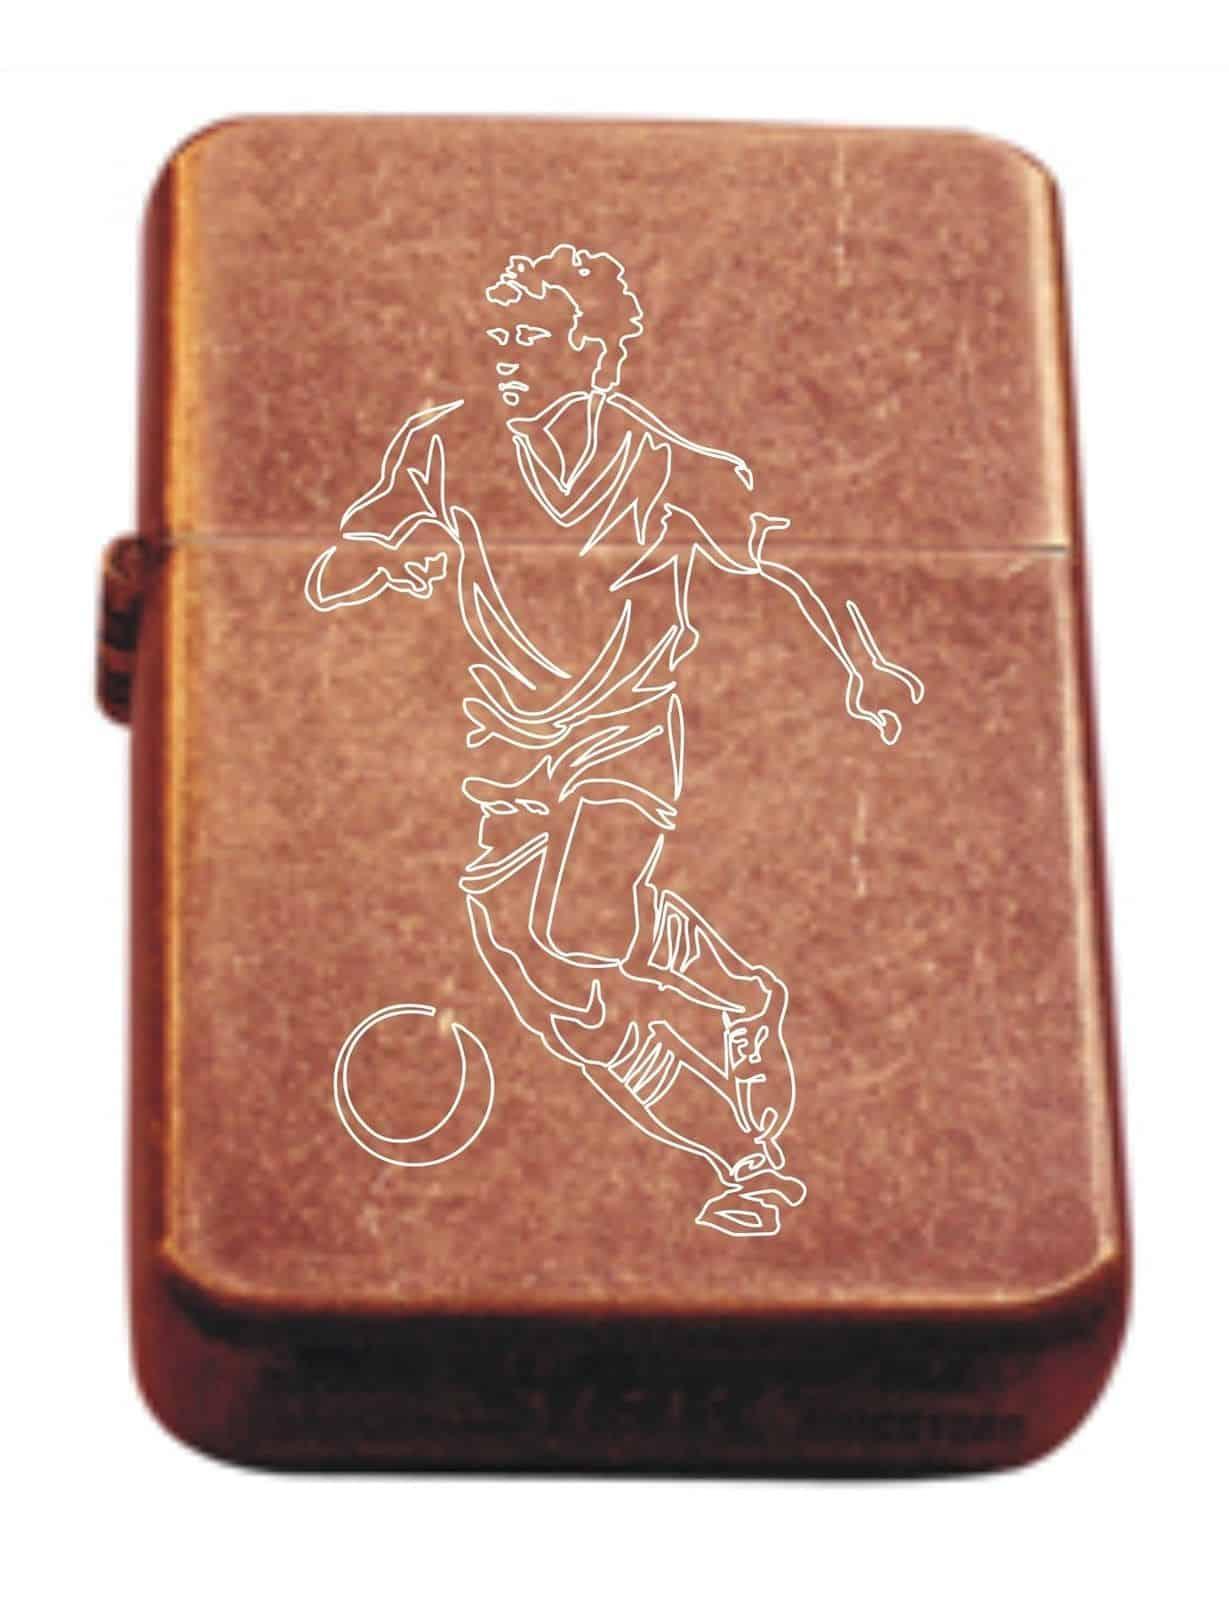 footballer-antique-copper